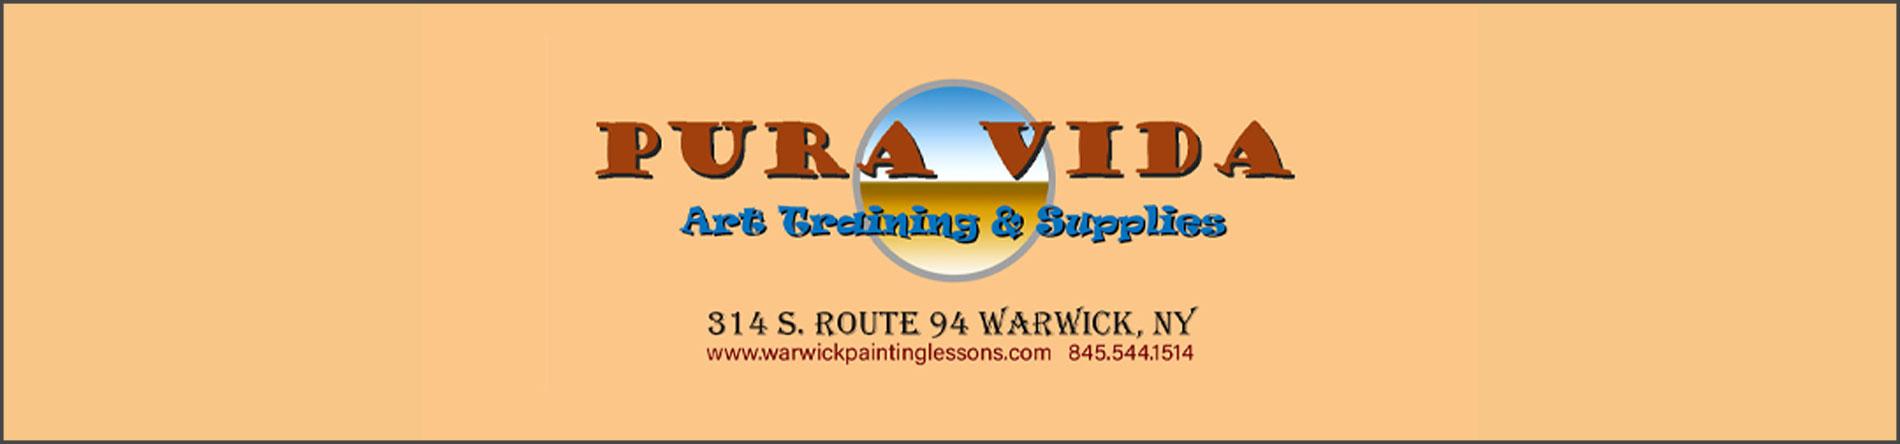 Pura Vida Art Training & Supplies is an Art School and Art Supplies Store in Warwick, NY